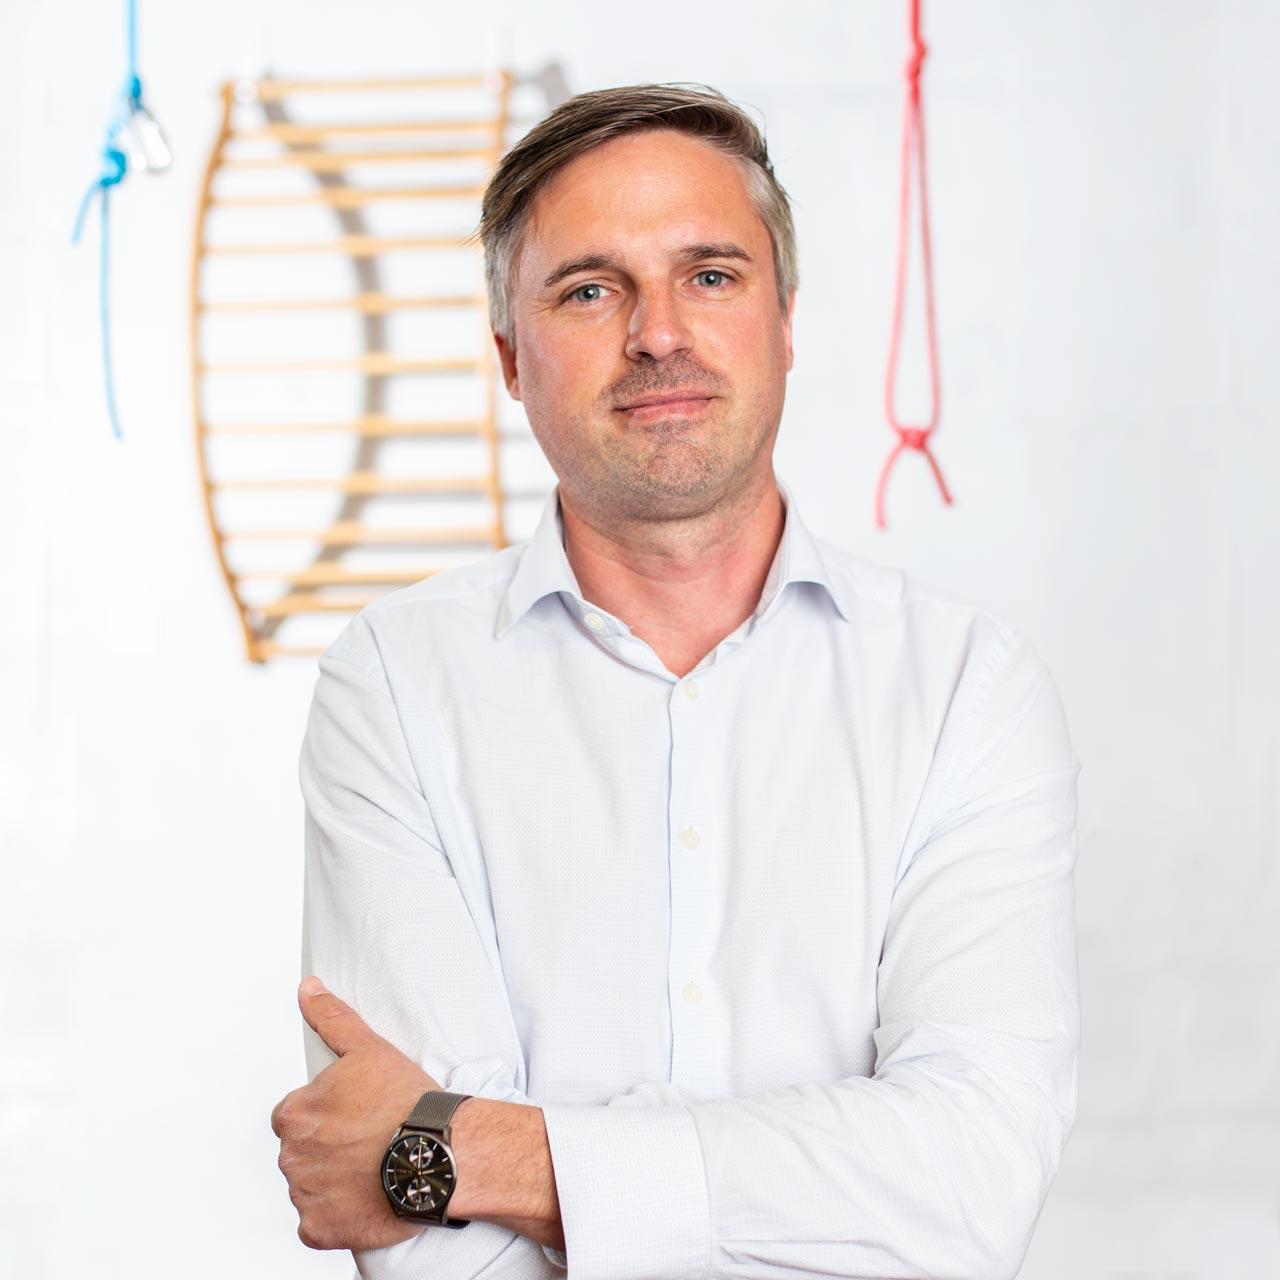 Hans-Jörg Neureiter